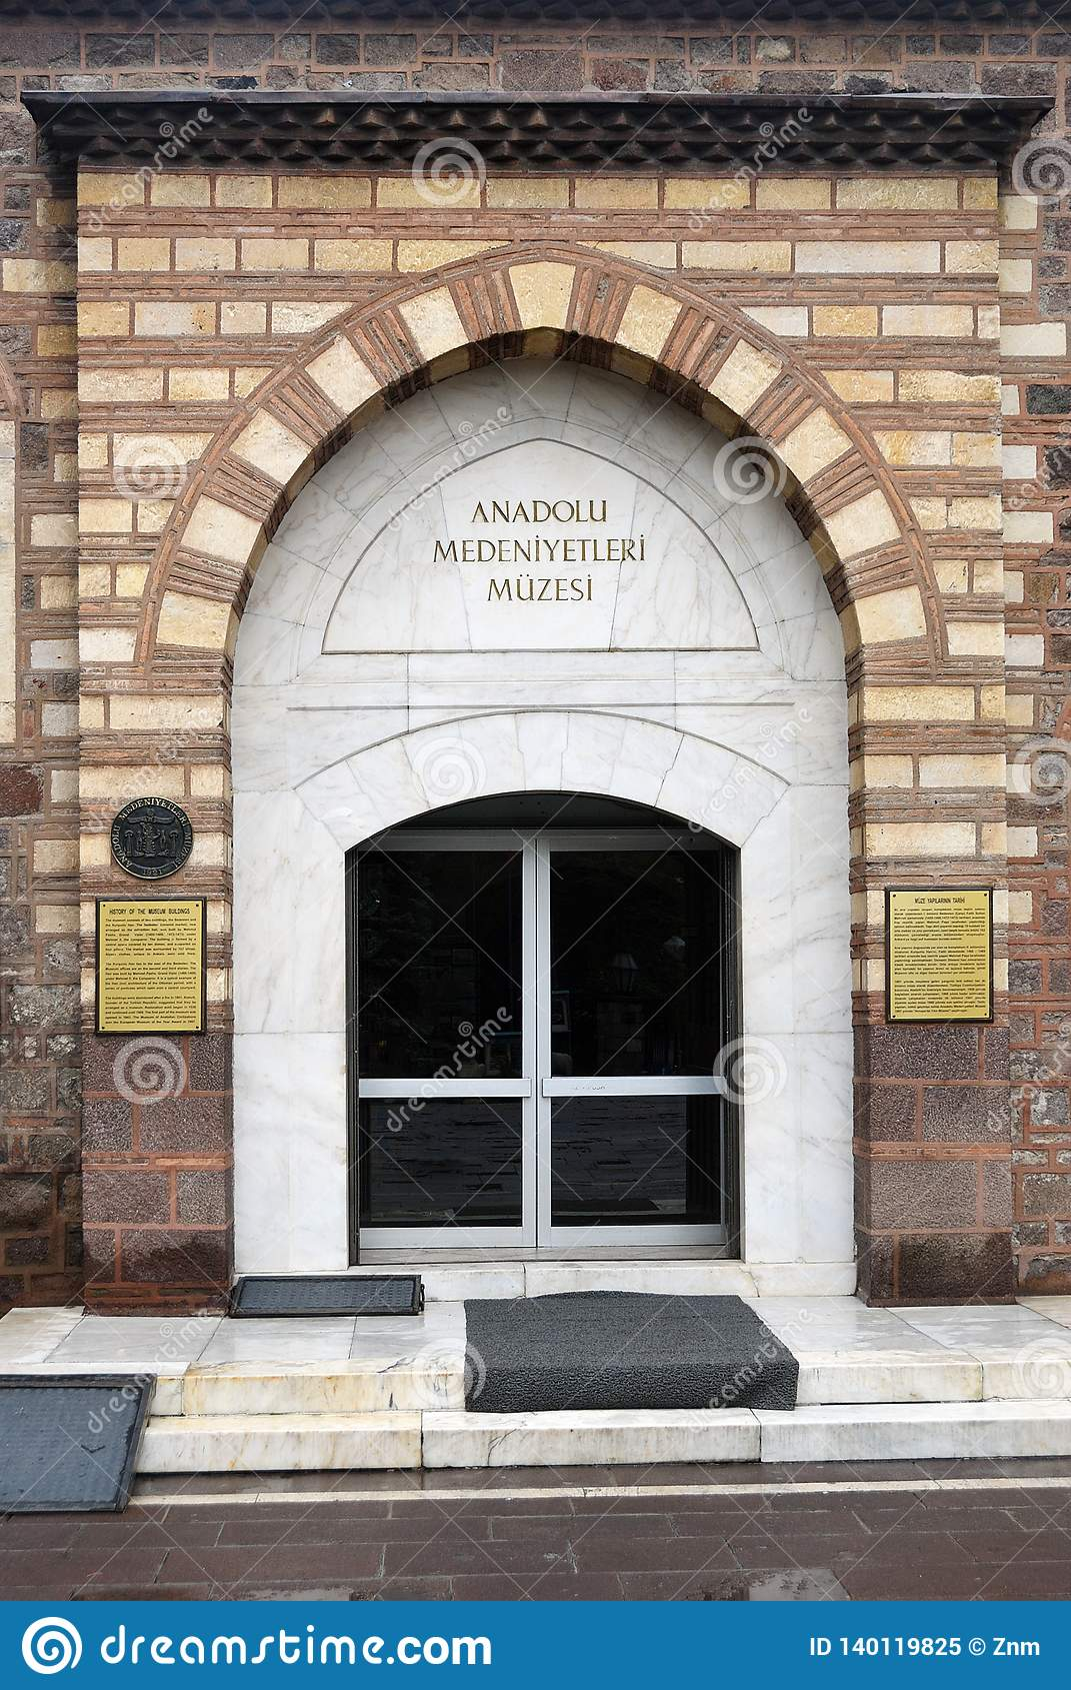 The Museum of Anatolian Civilizations